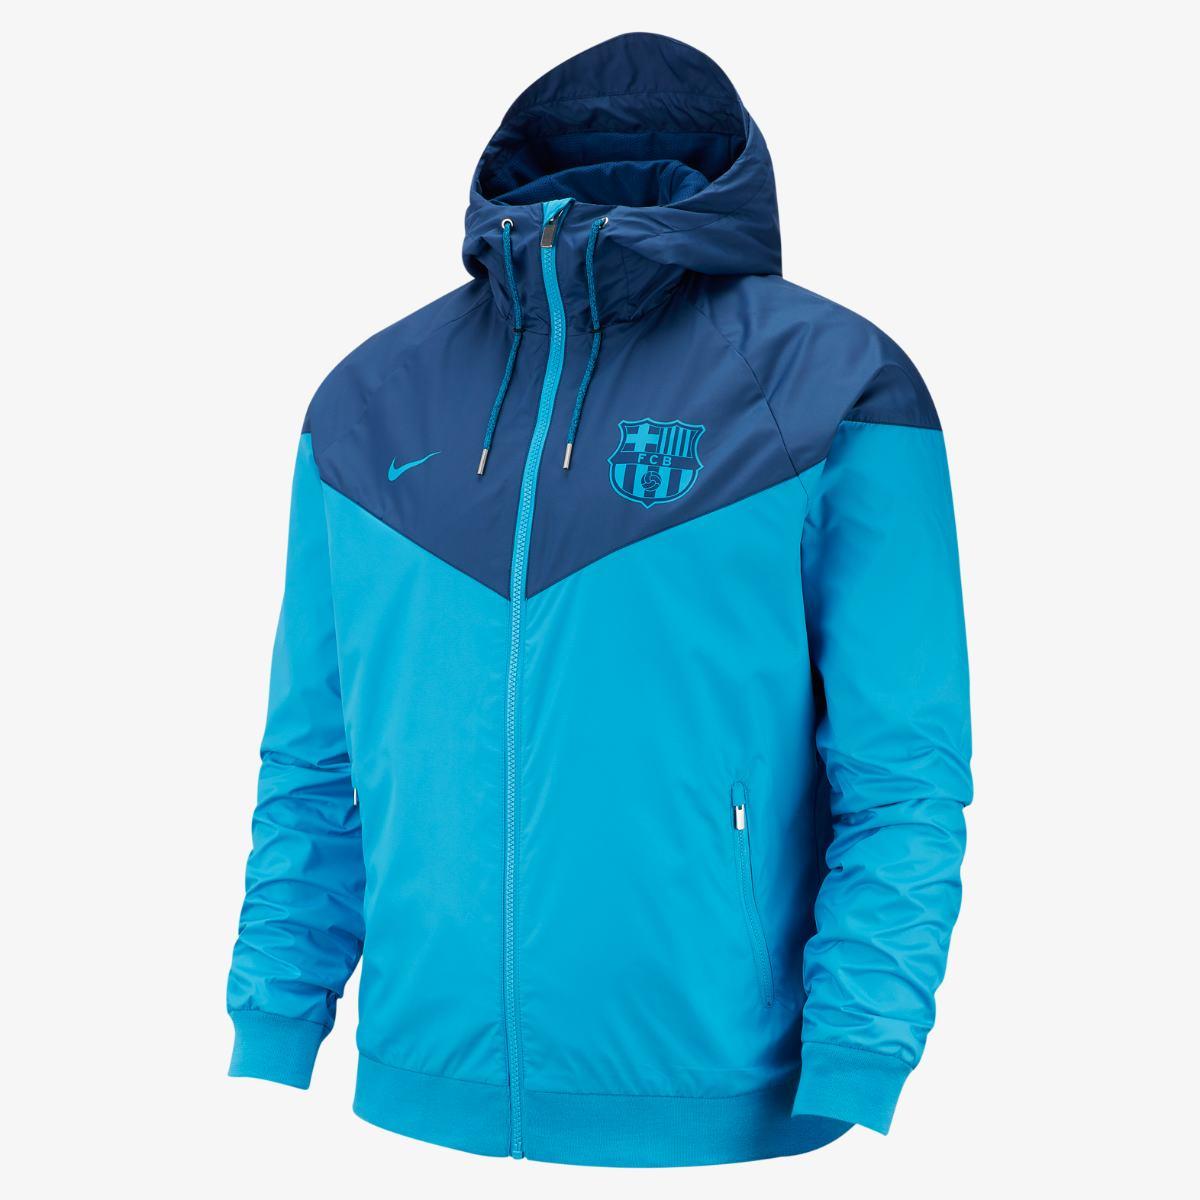 Ветровка Nike FCB M NSW WR WVN AUT 892420-482 купить  355788790c7dd